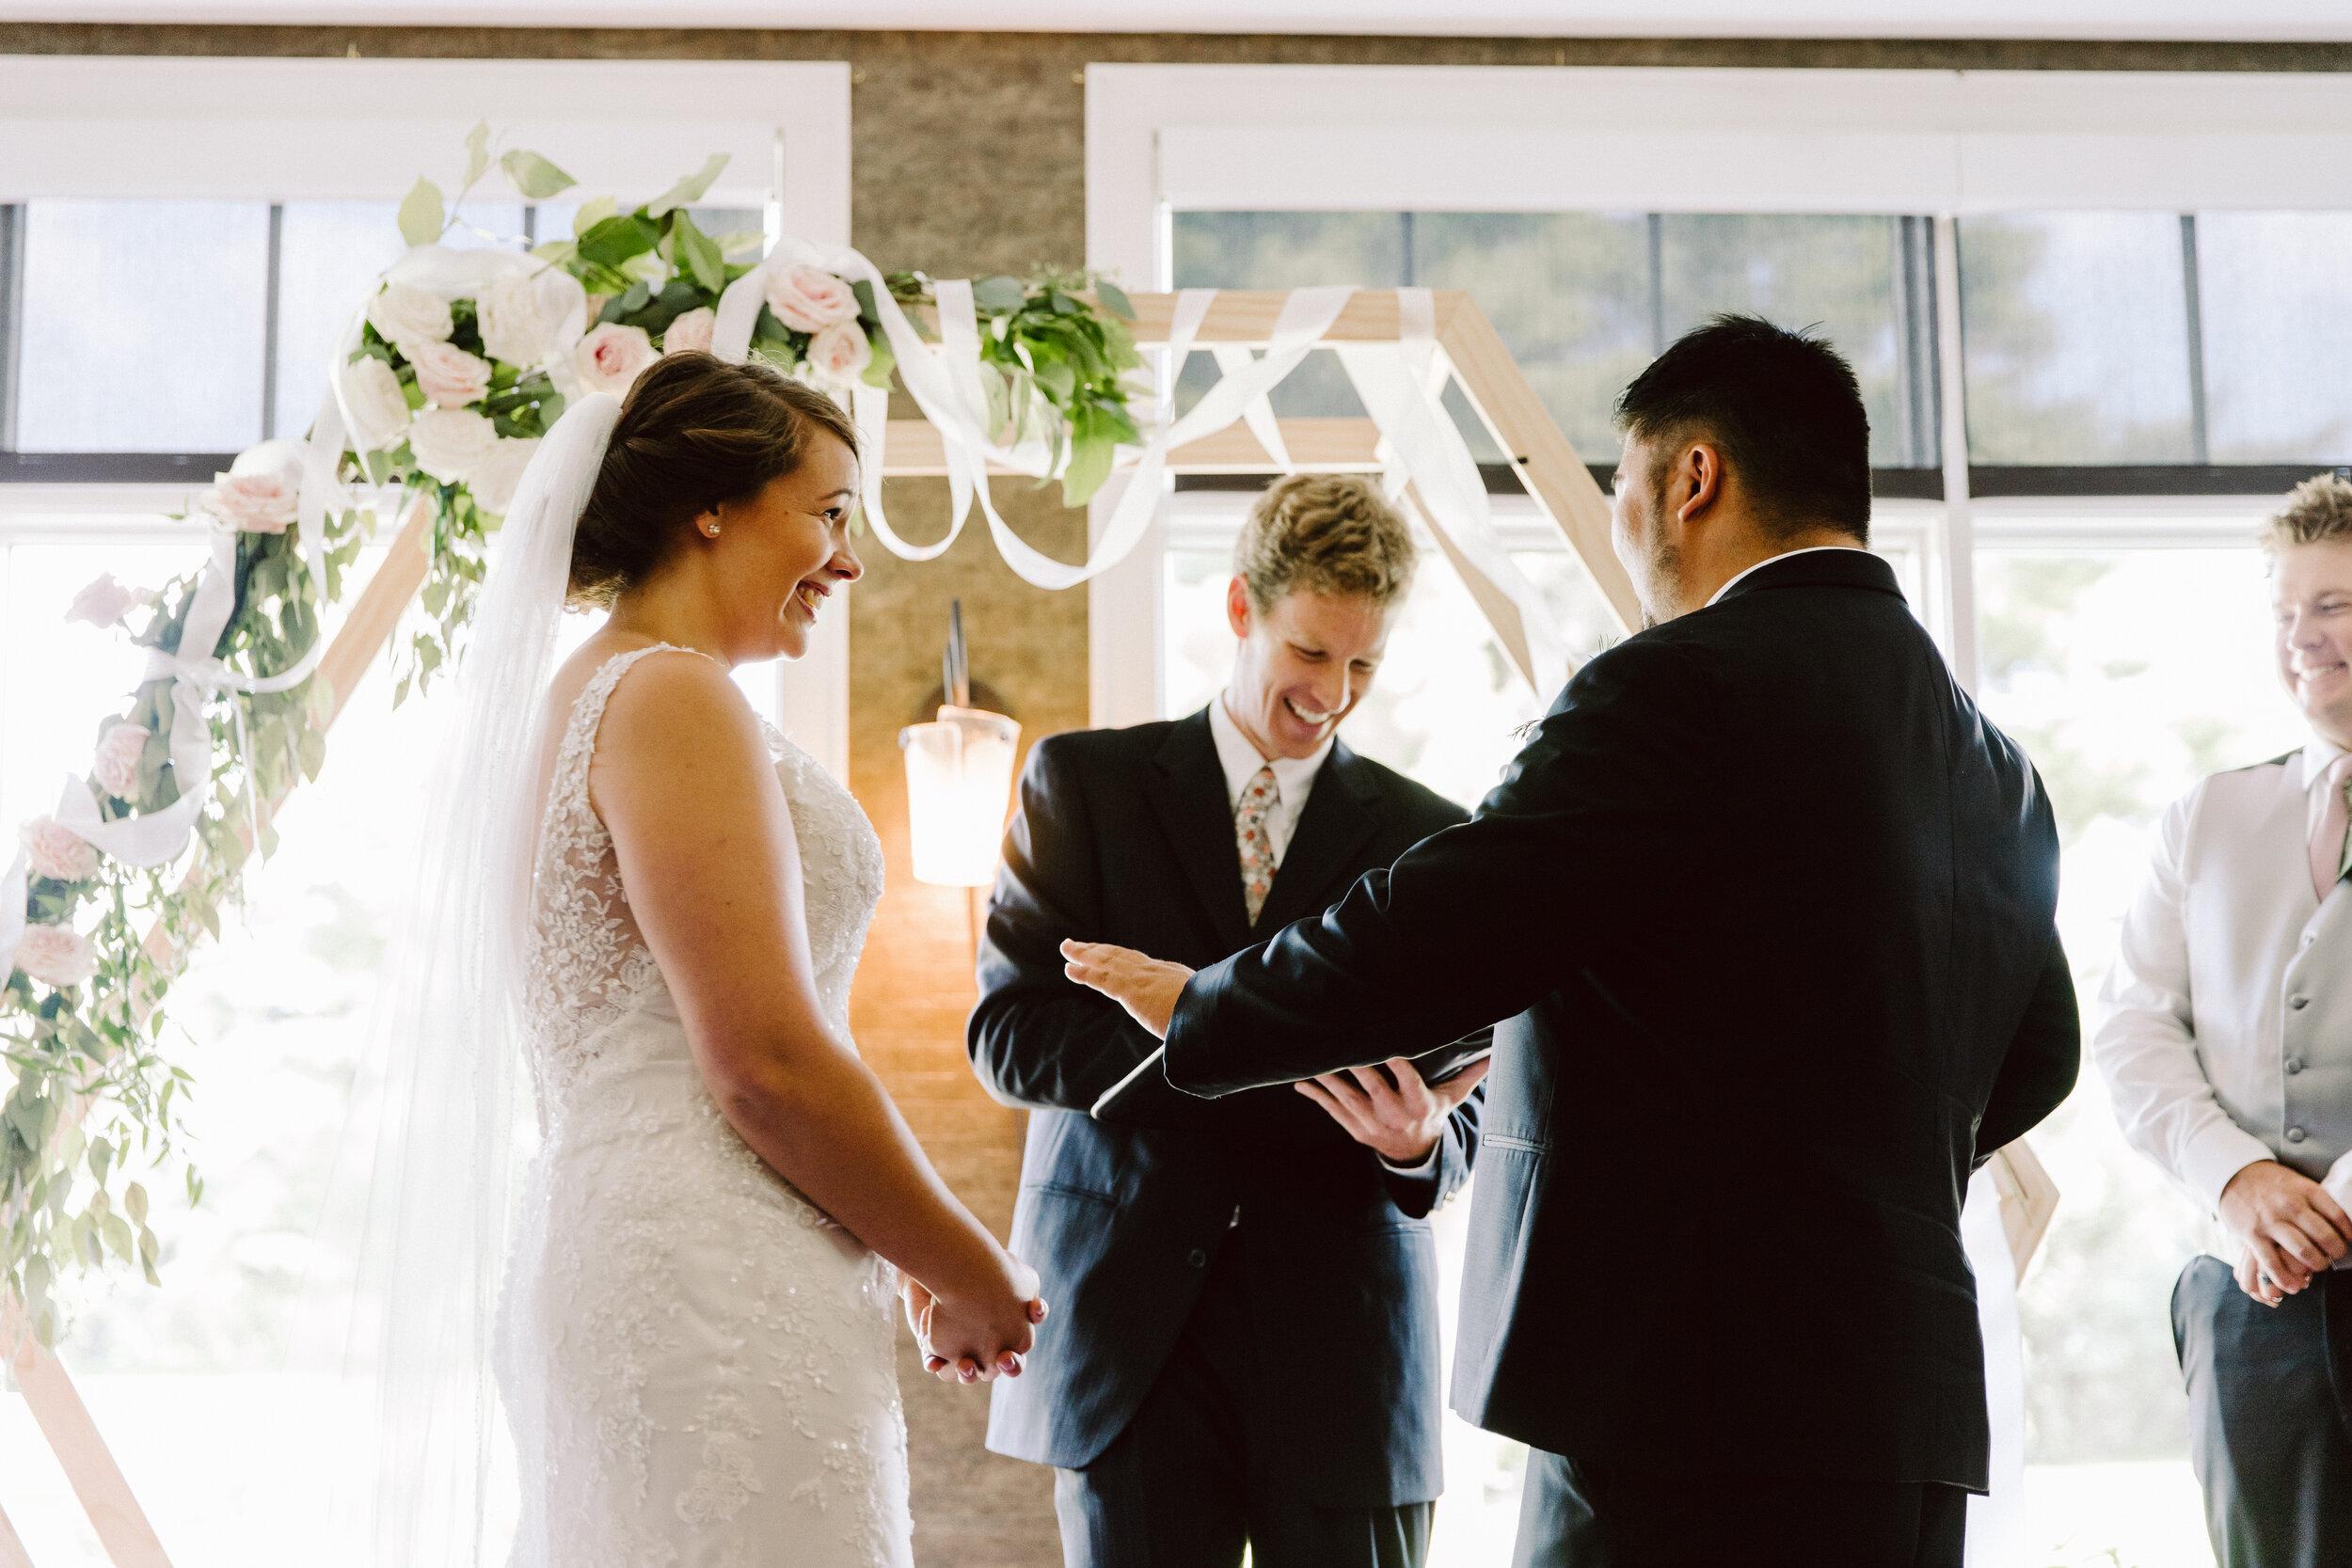 S&B Wedding - Ceremony-45.jpg